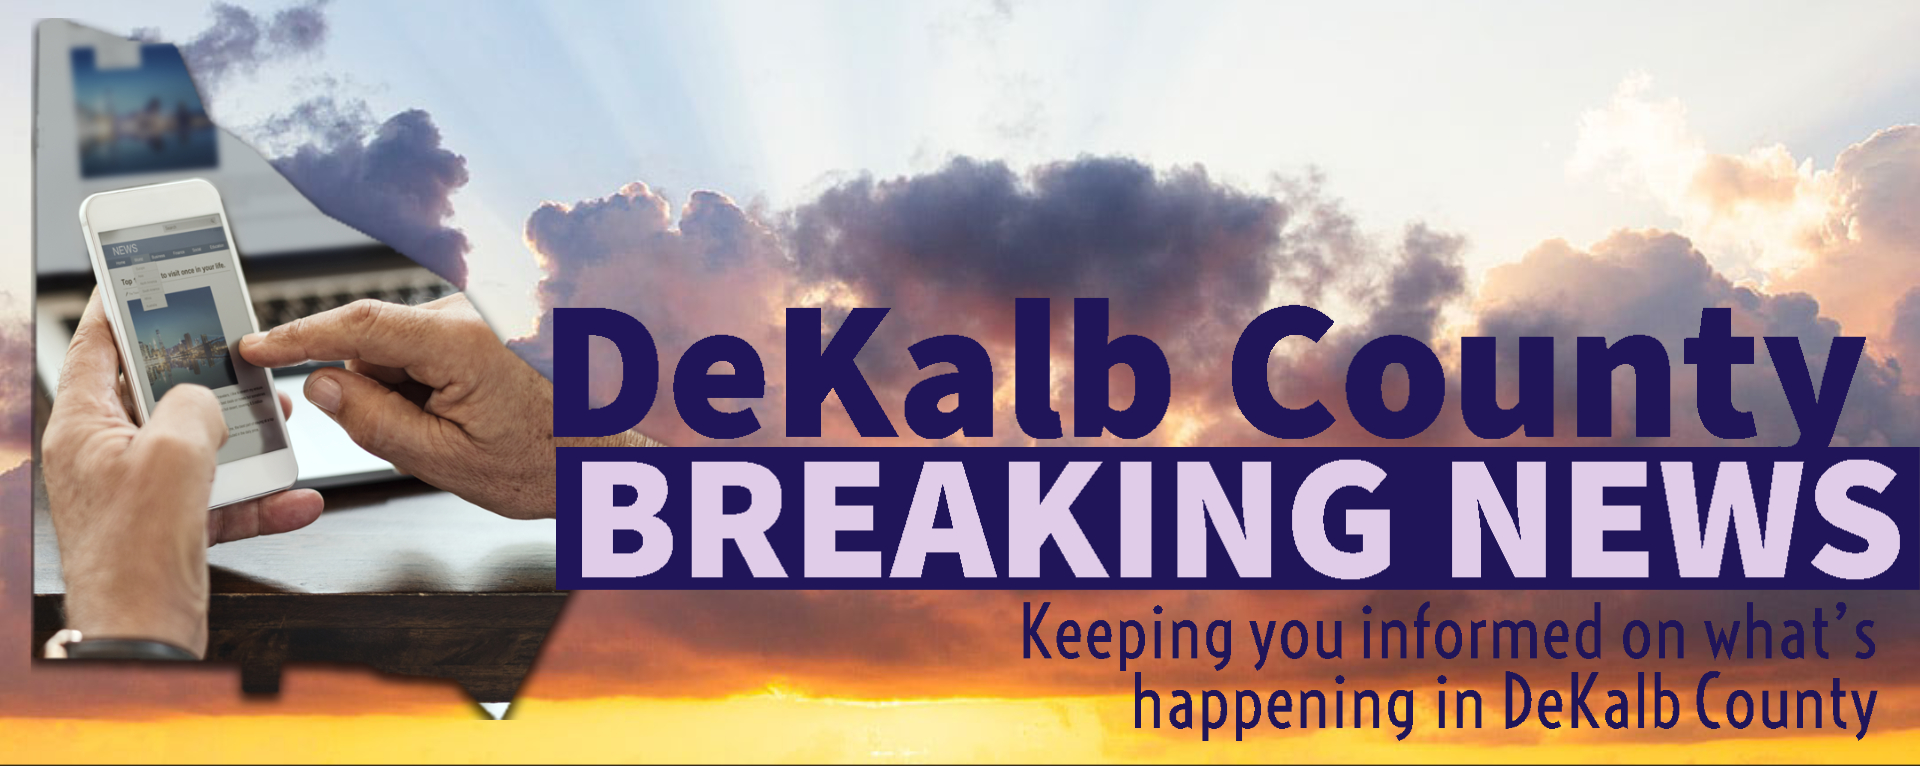 Breaking News for DeKalb County